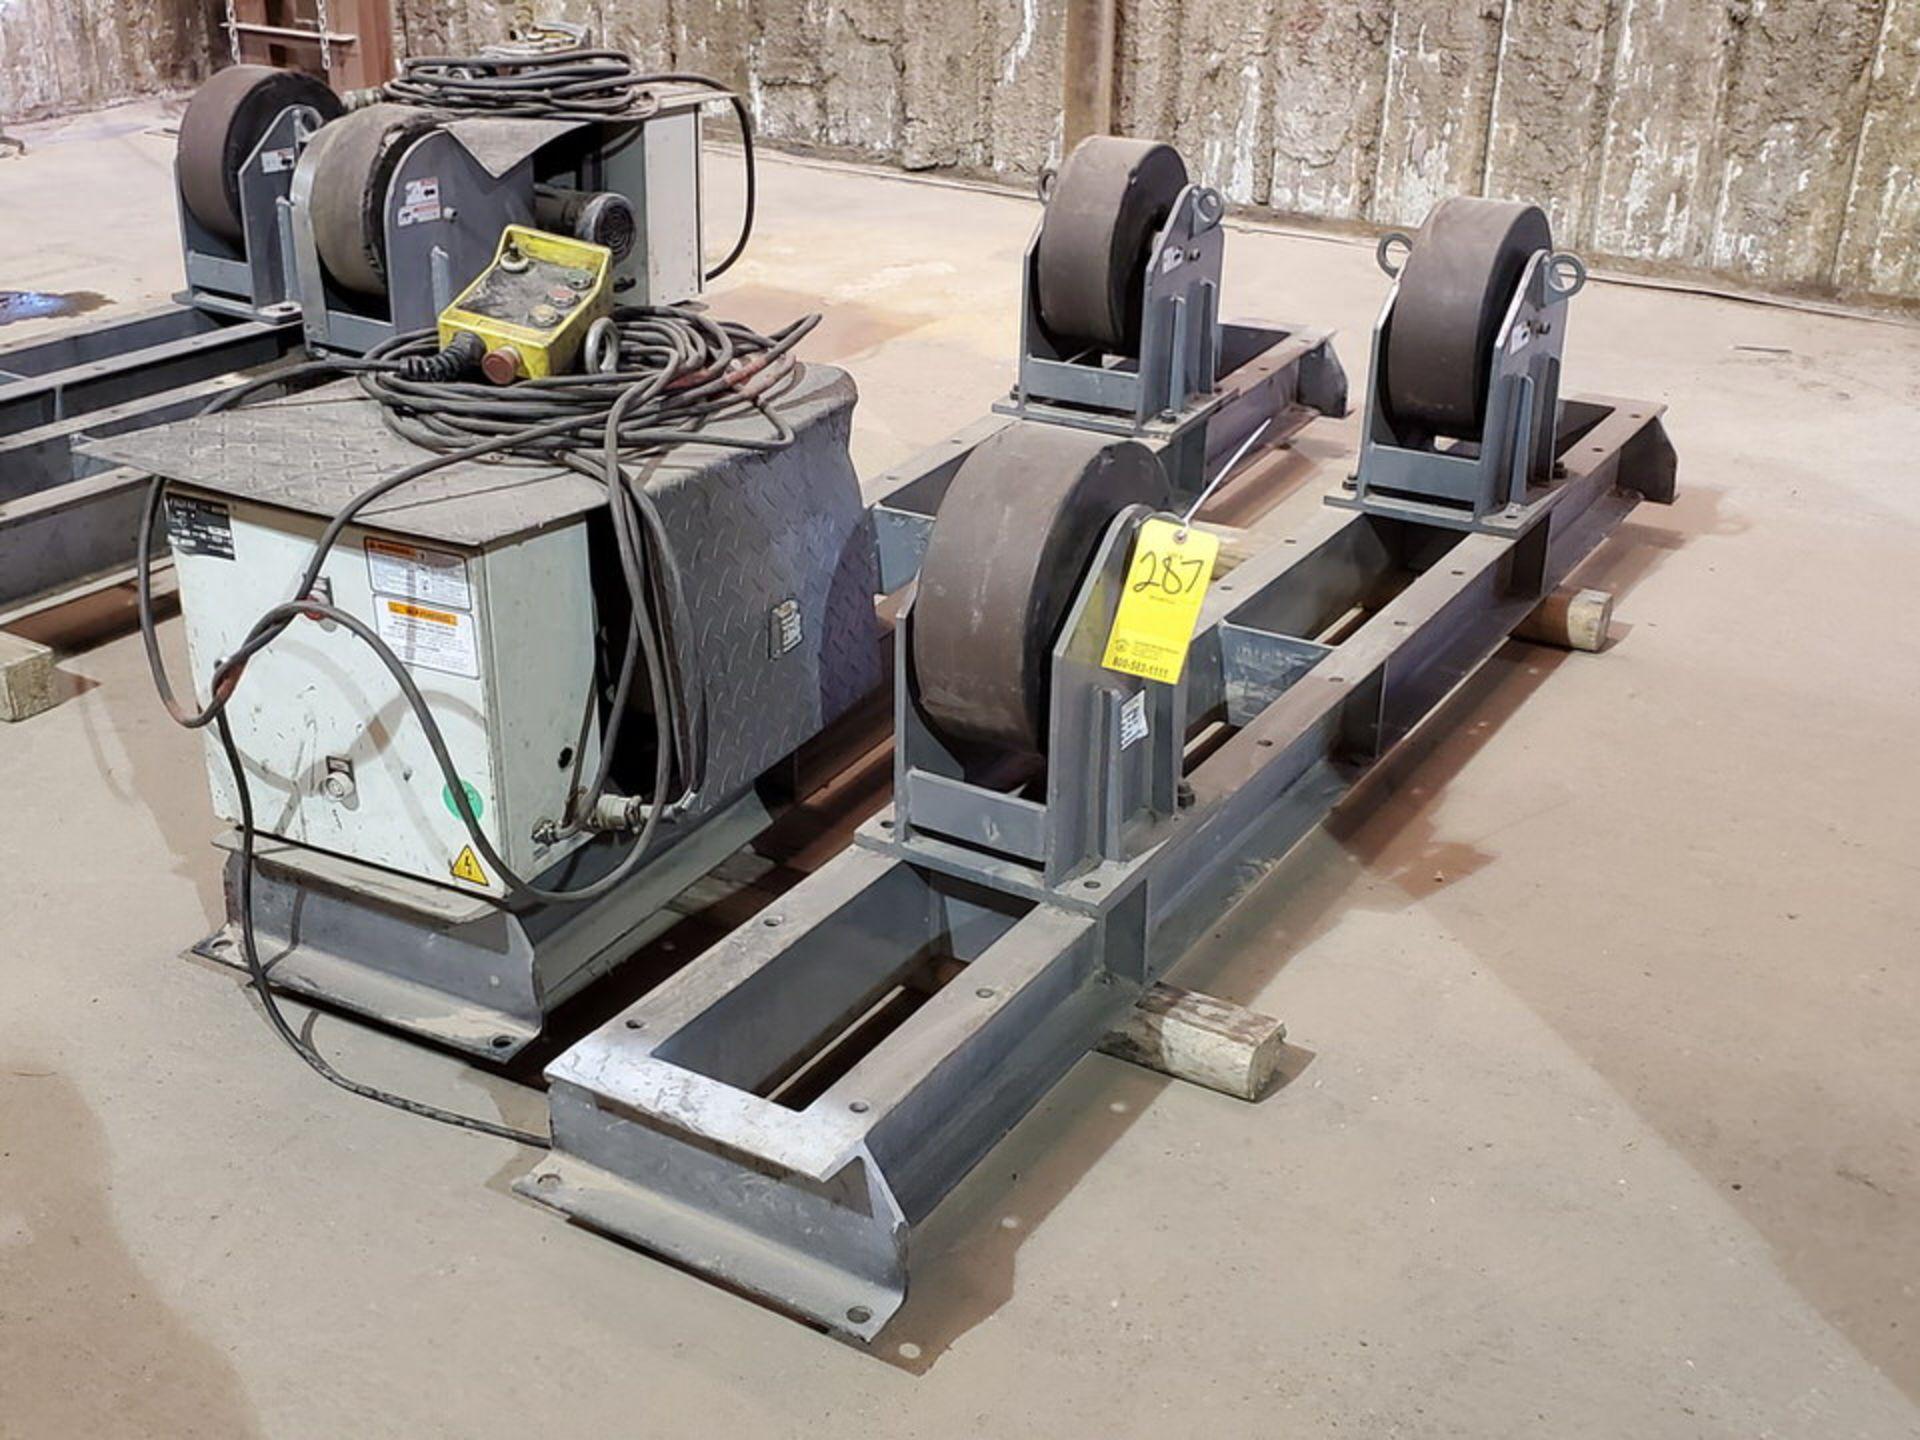 "Profax TR-20000 Turn Roll 10K Cap., 115V, 15A, 50/60HZ, 1PH, RPM: 0-1.9; 5"" Wheel Dia. - Image 3 of 8"